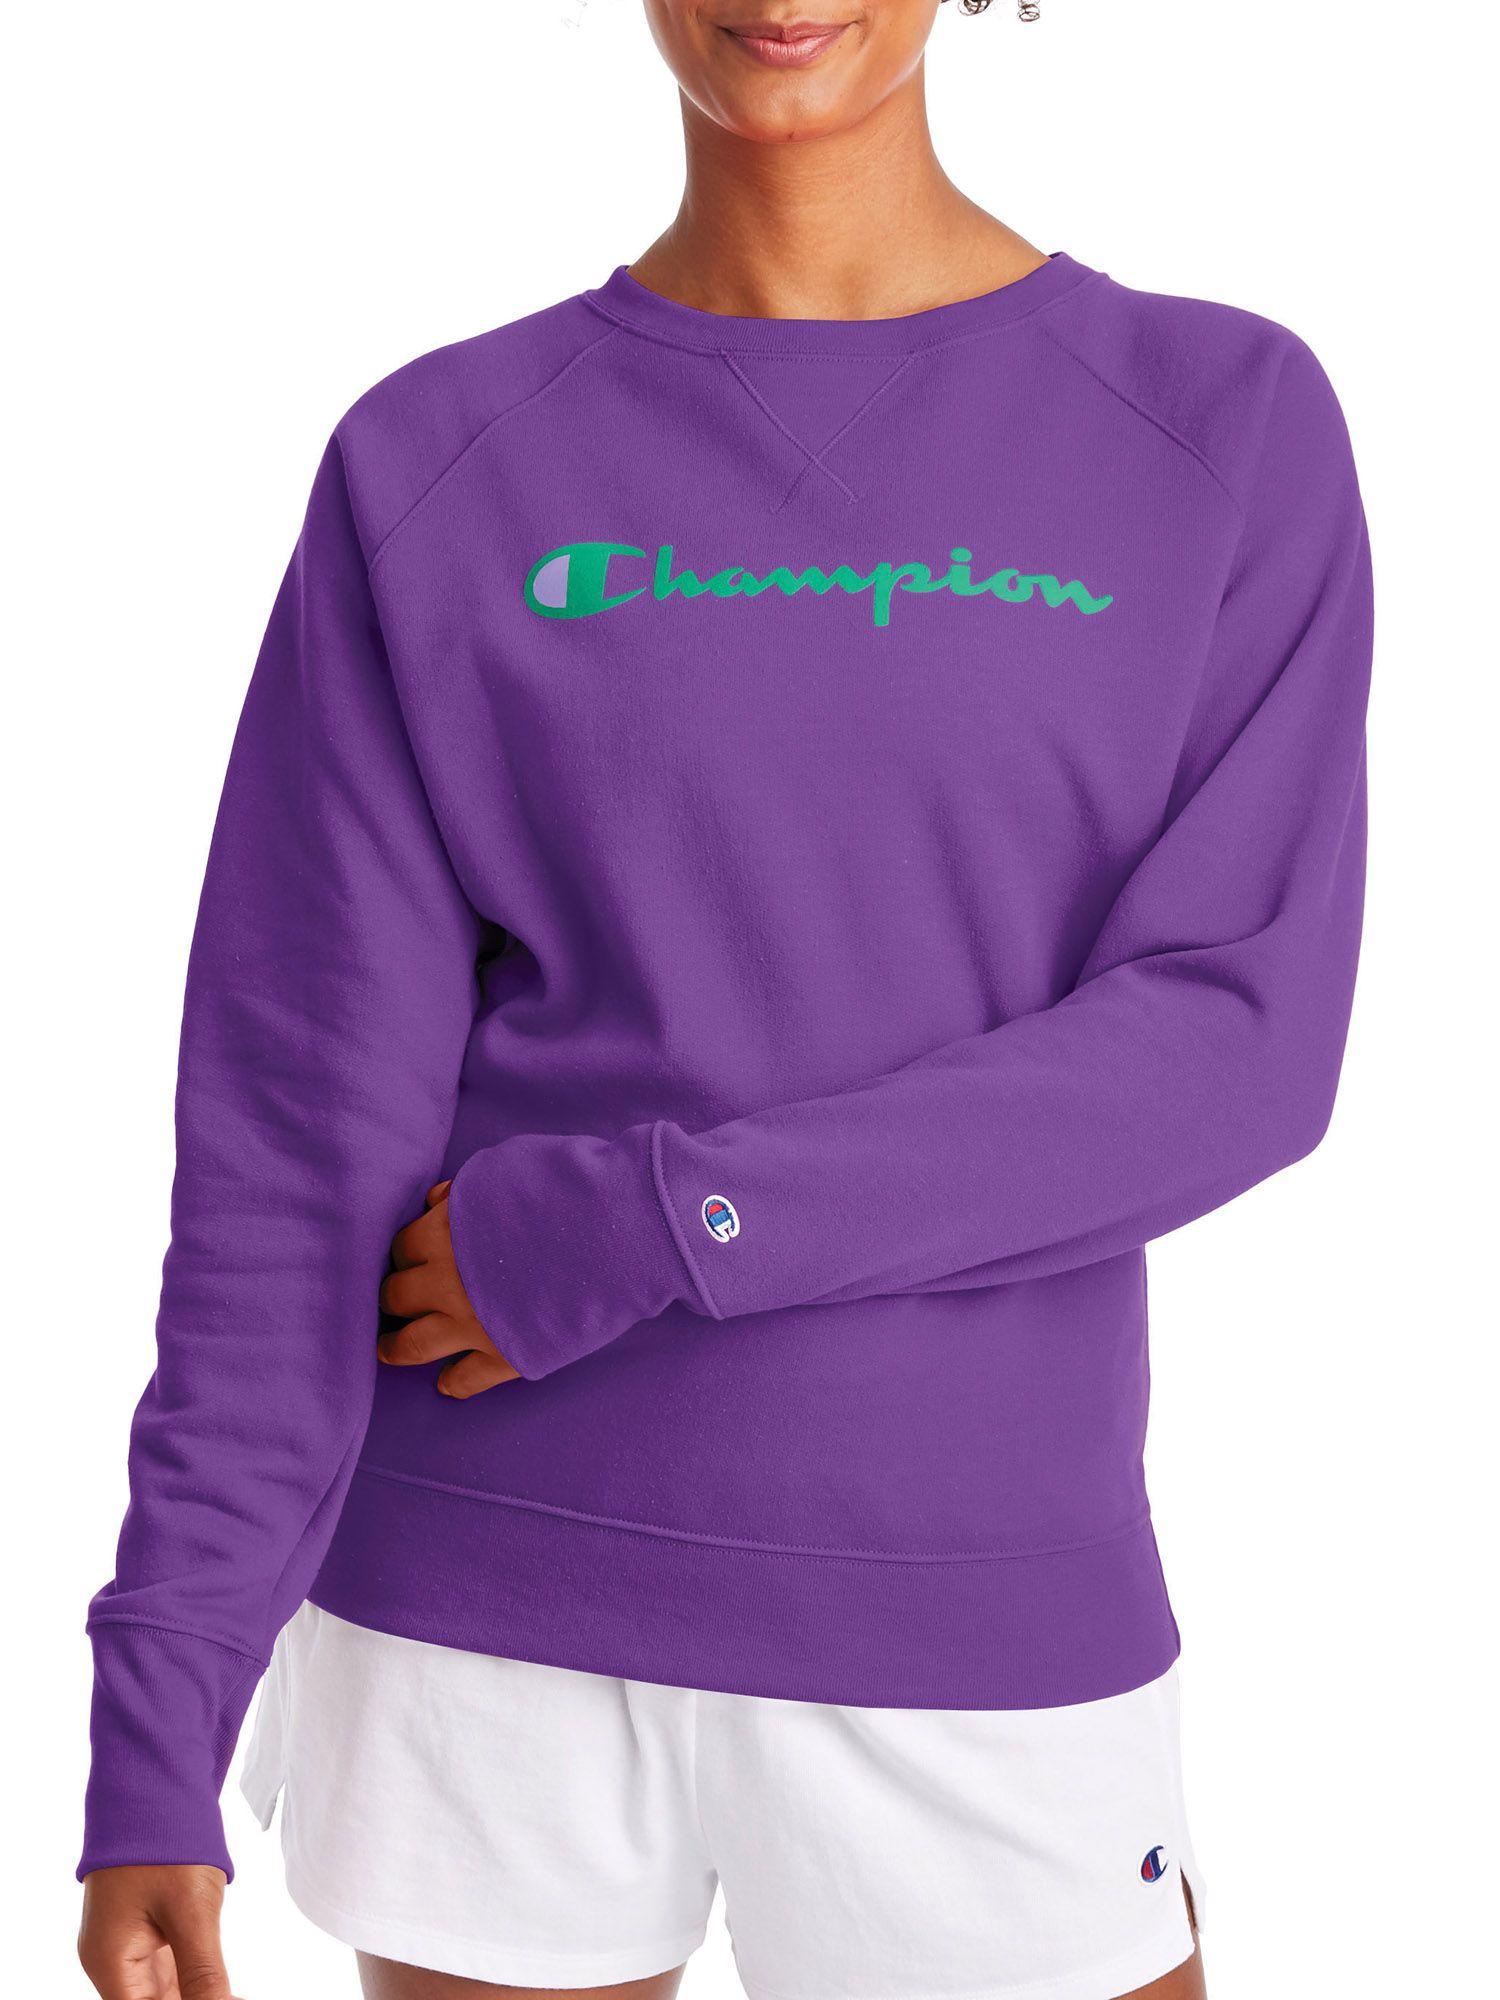 Champion Champion Women S Powerblend Graphic Fleece Boyfriend Crewneck Sweatshirt Walmart Com Sweatshirts Graphic Crewneck Sweatshirt Crew Neck Sweatshirt [ 2000 x 1500 Pixel ]